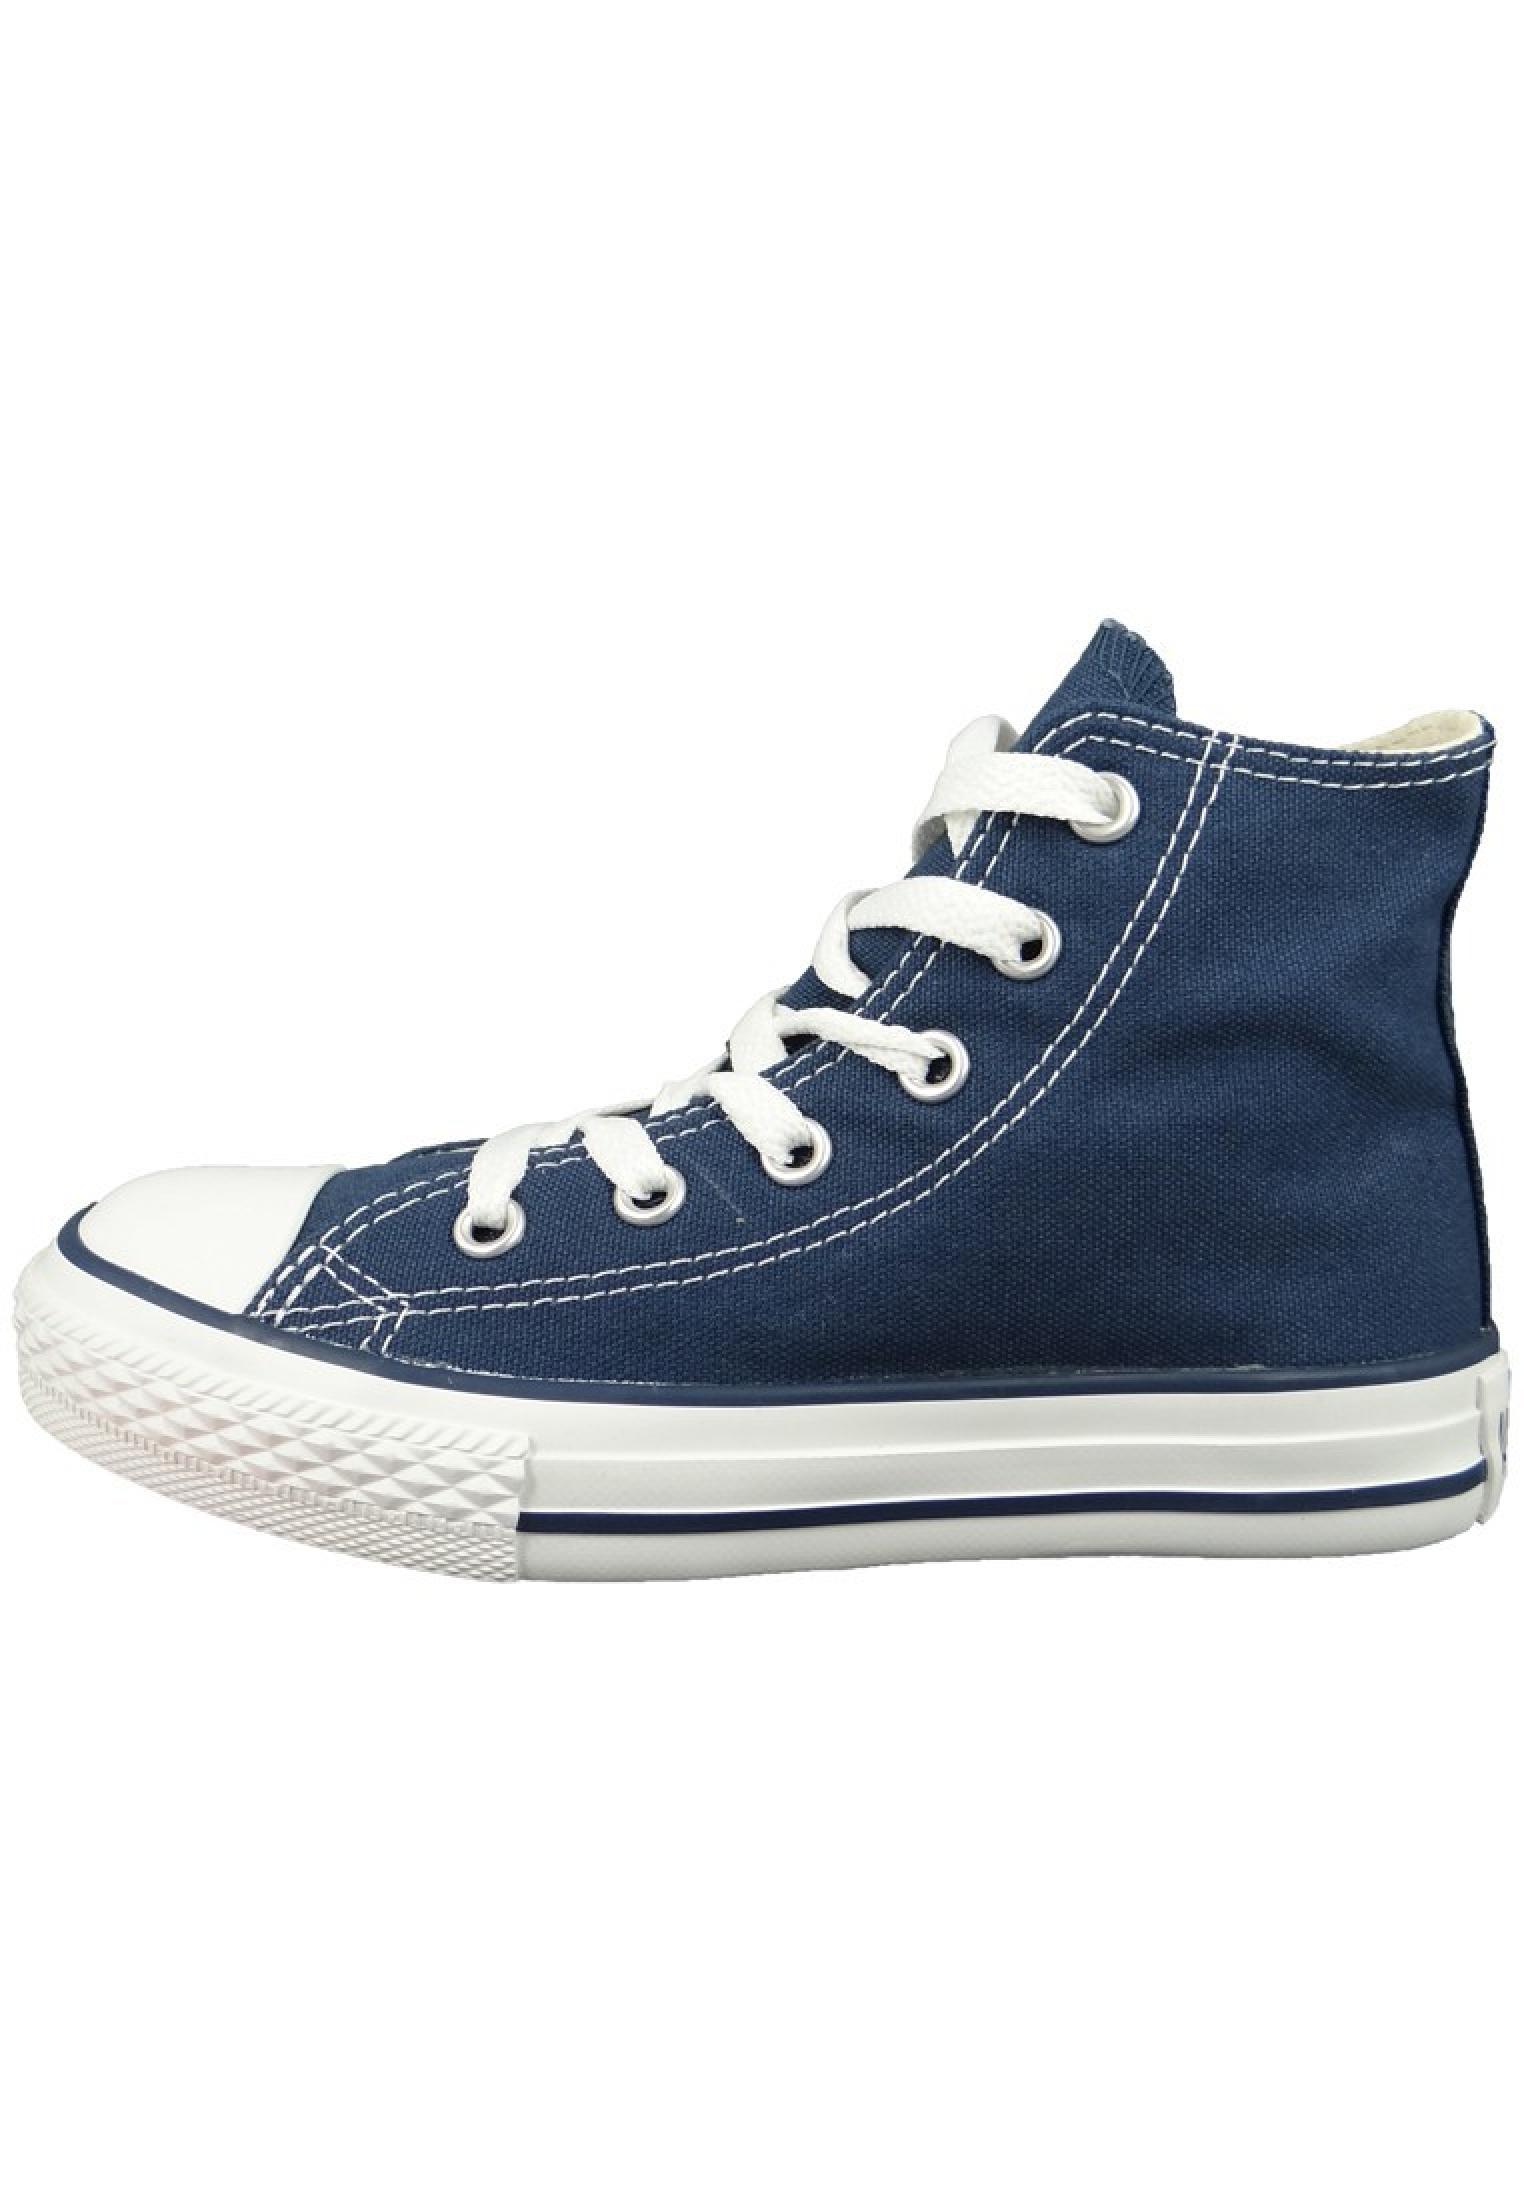 converse chucks kinder 3j233c as hi can navy blau marken converse. Black Bedroom Furniture Sets. Home Design Ideas